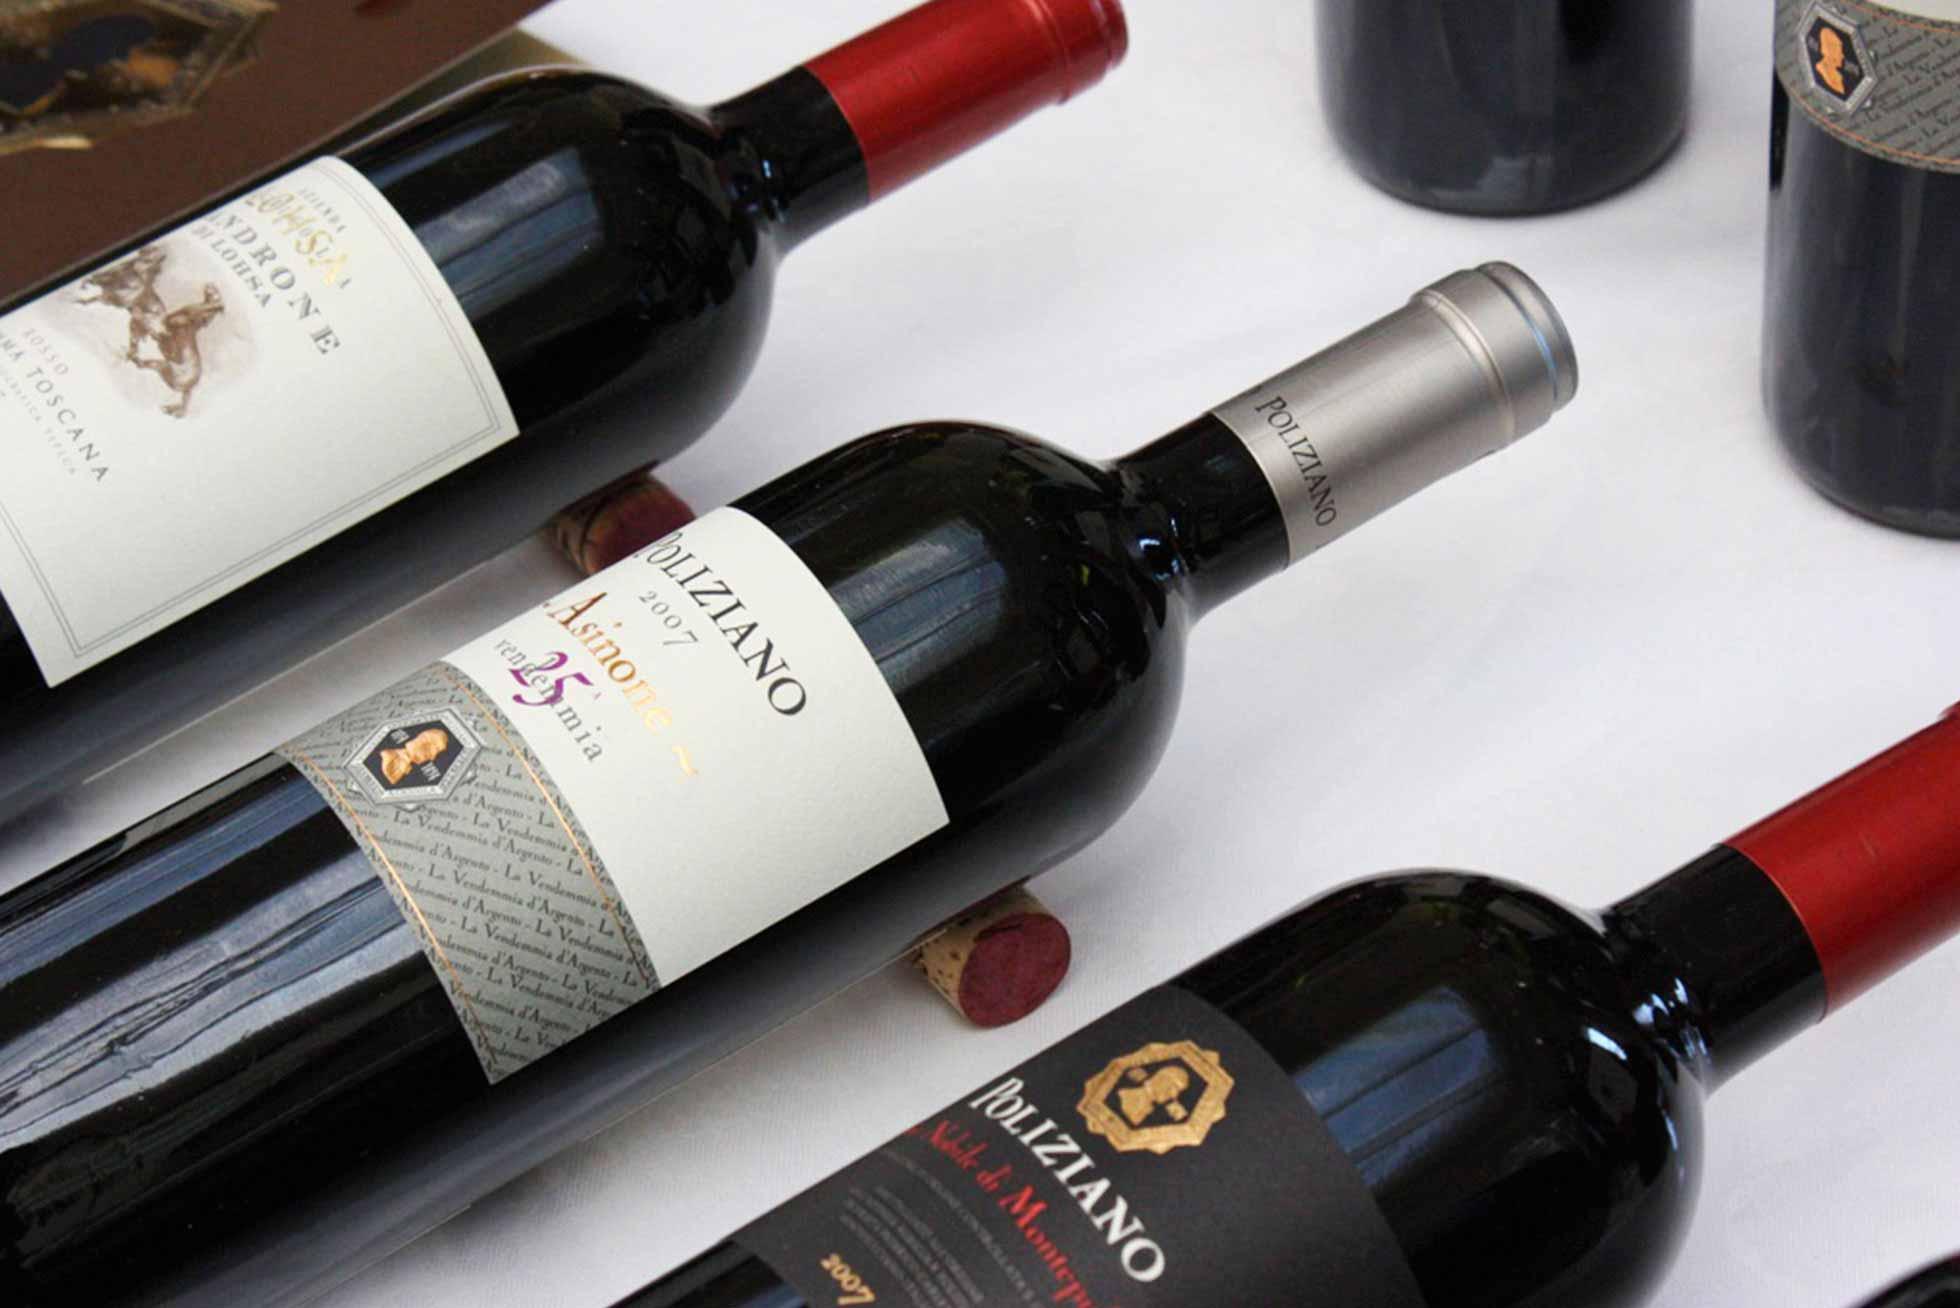 Boccanegra Florence - Nobile di Montepulciano wine bottles